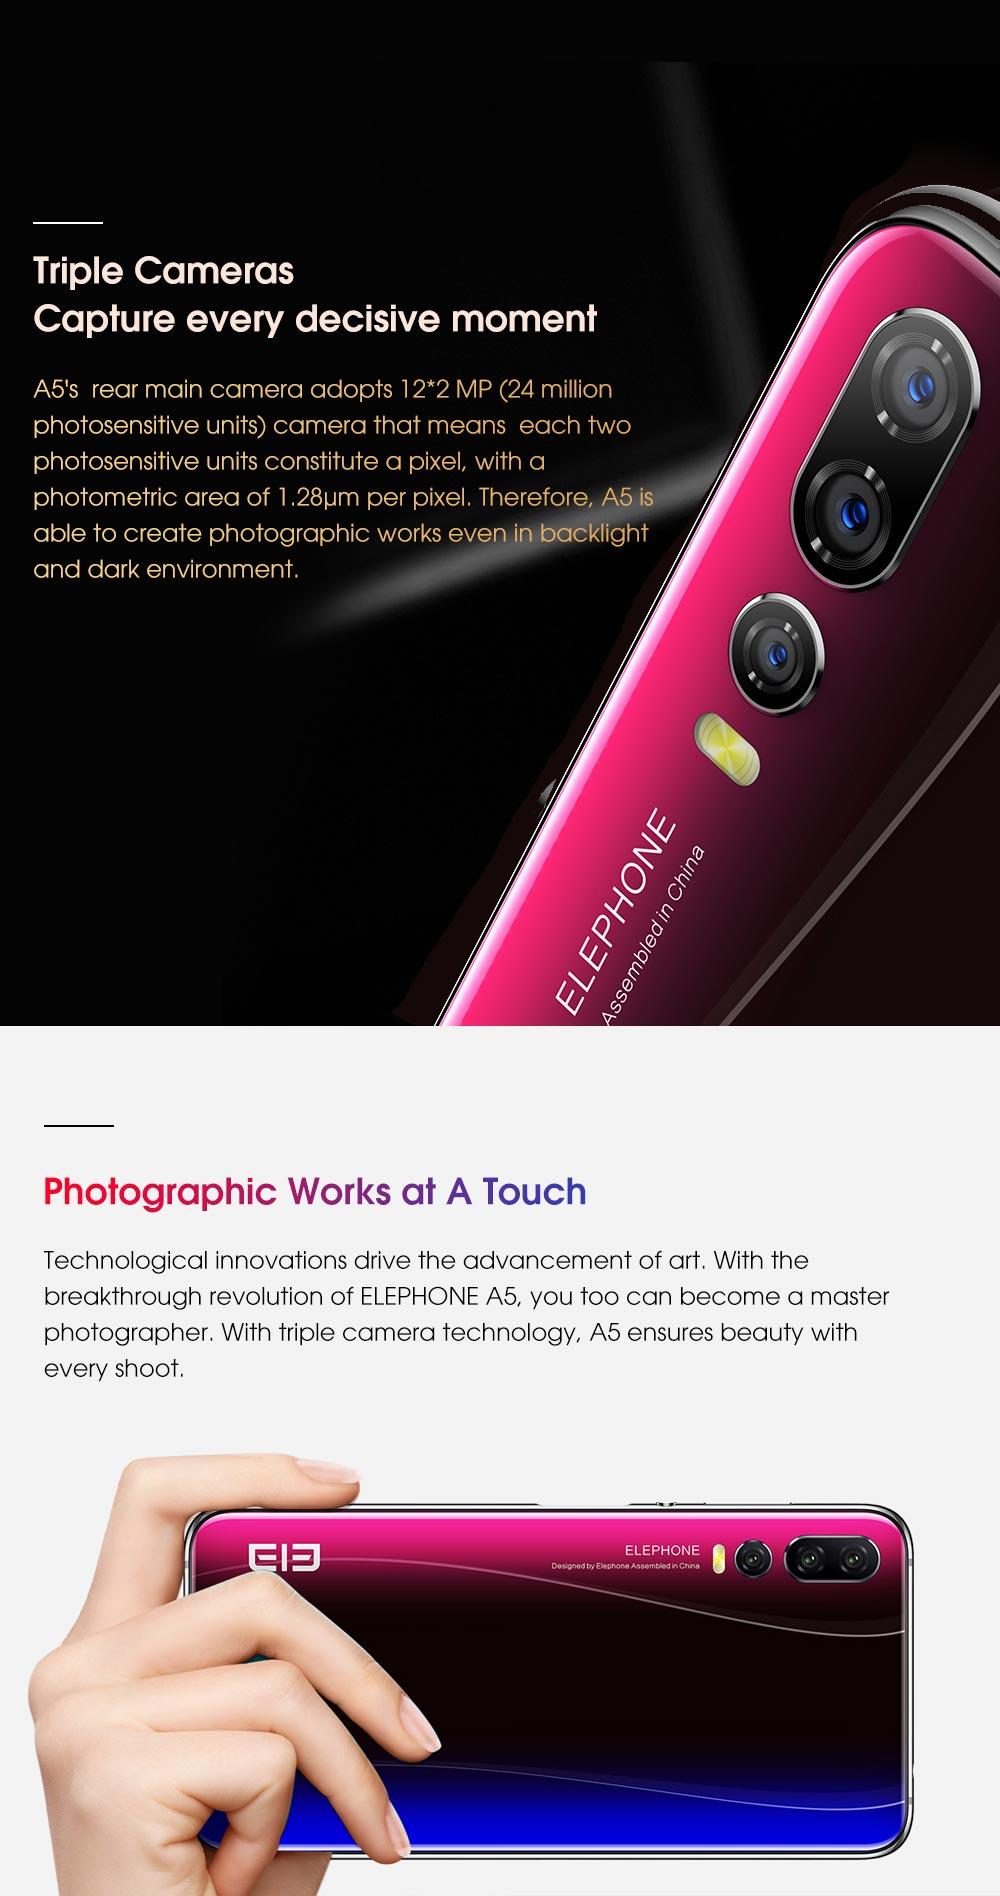 buy elephone a5 smartphone 6gb/128gb